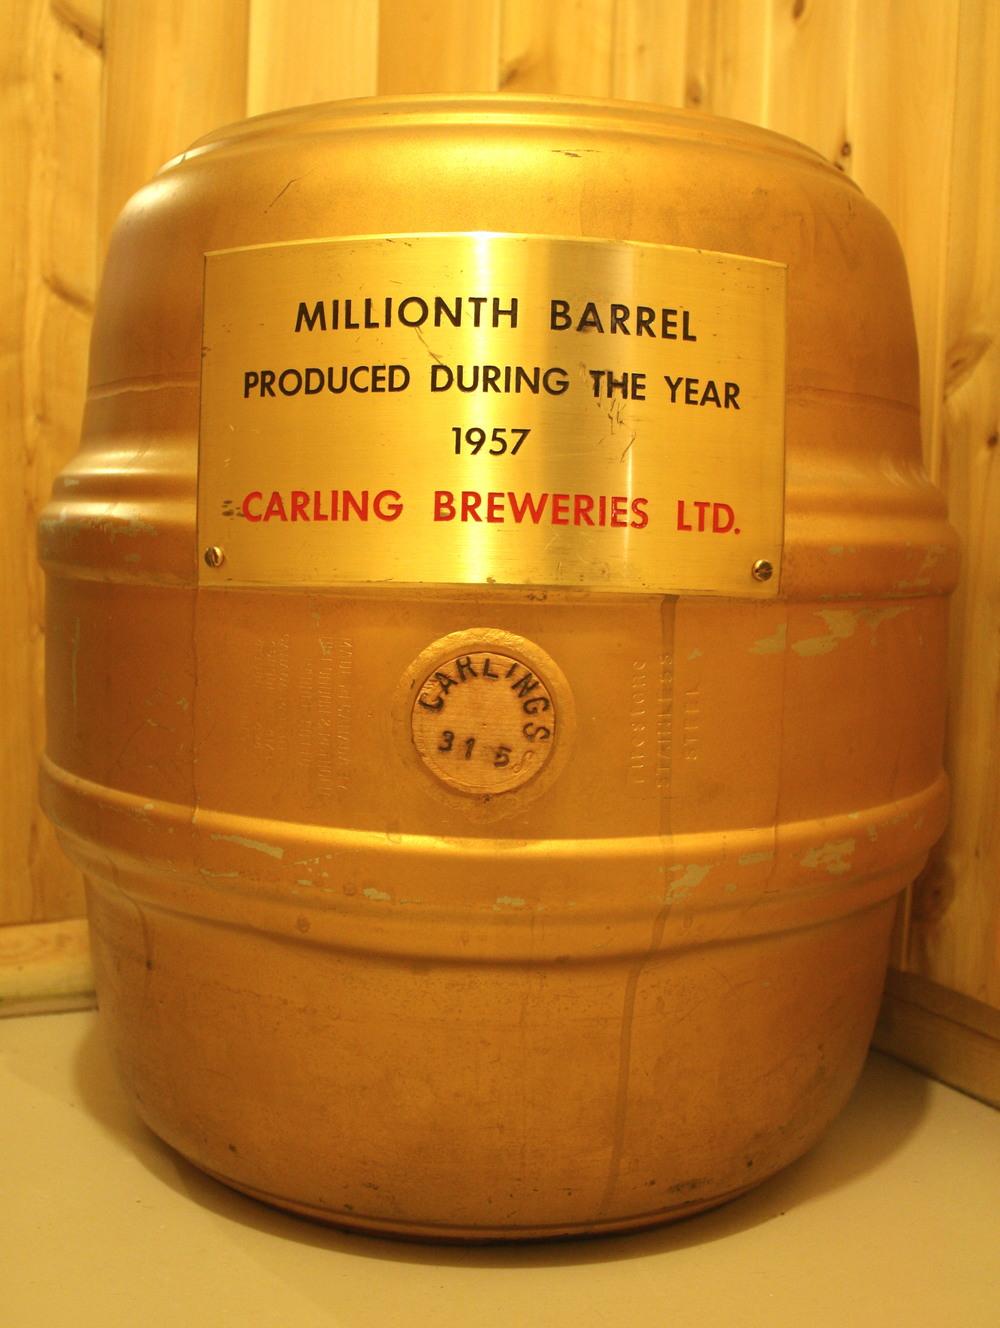 Barrel - Carling Breweries Ltd_Millionth Barrel_1957.JPG